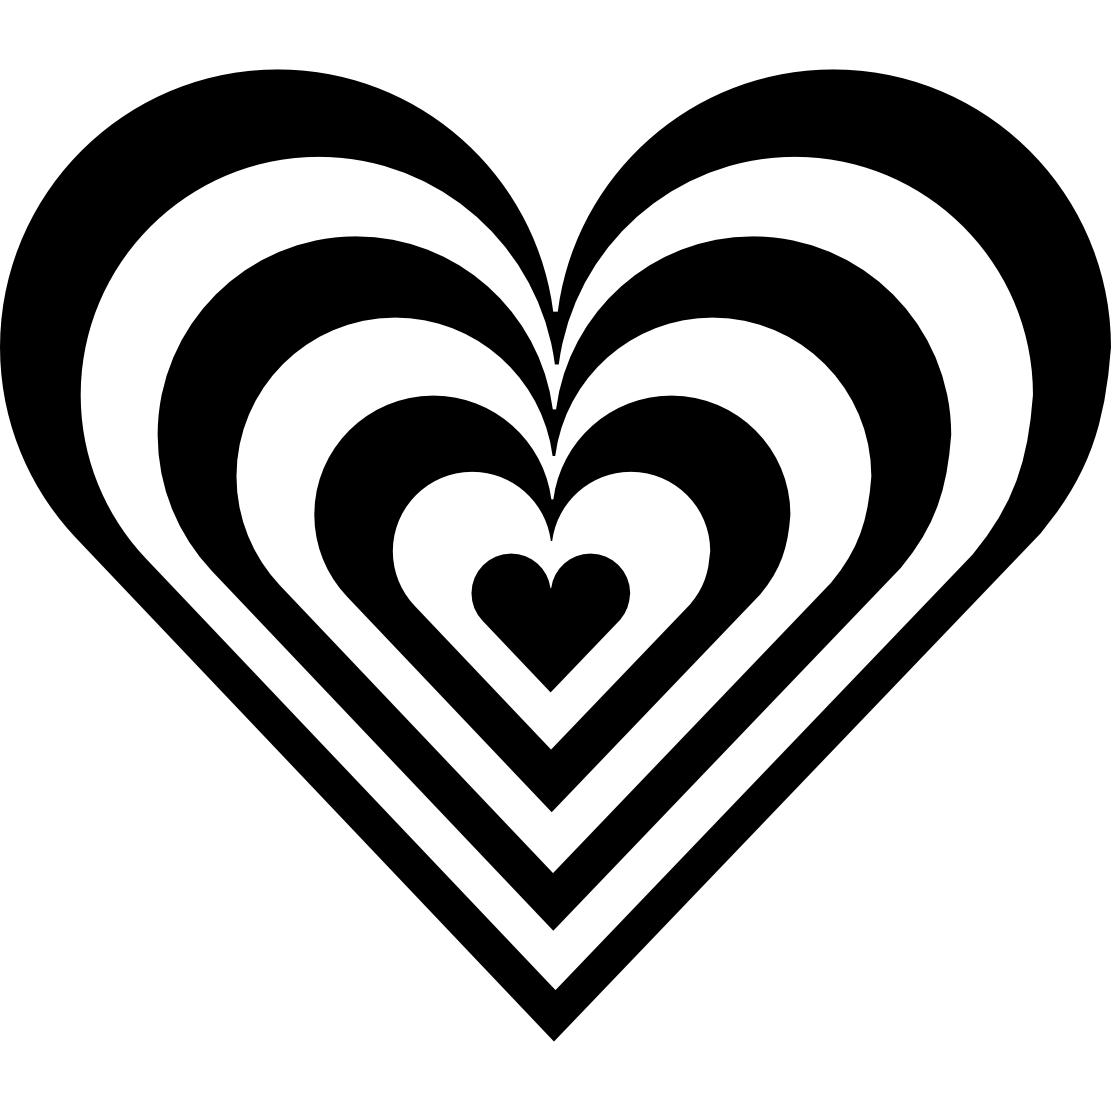 Black heart clipart 9